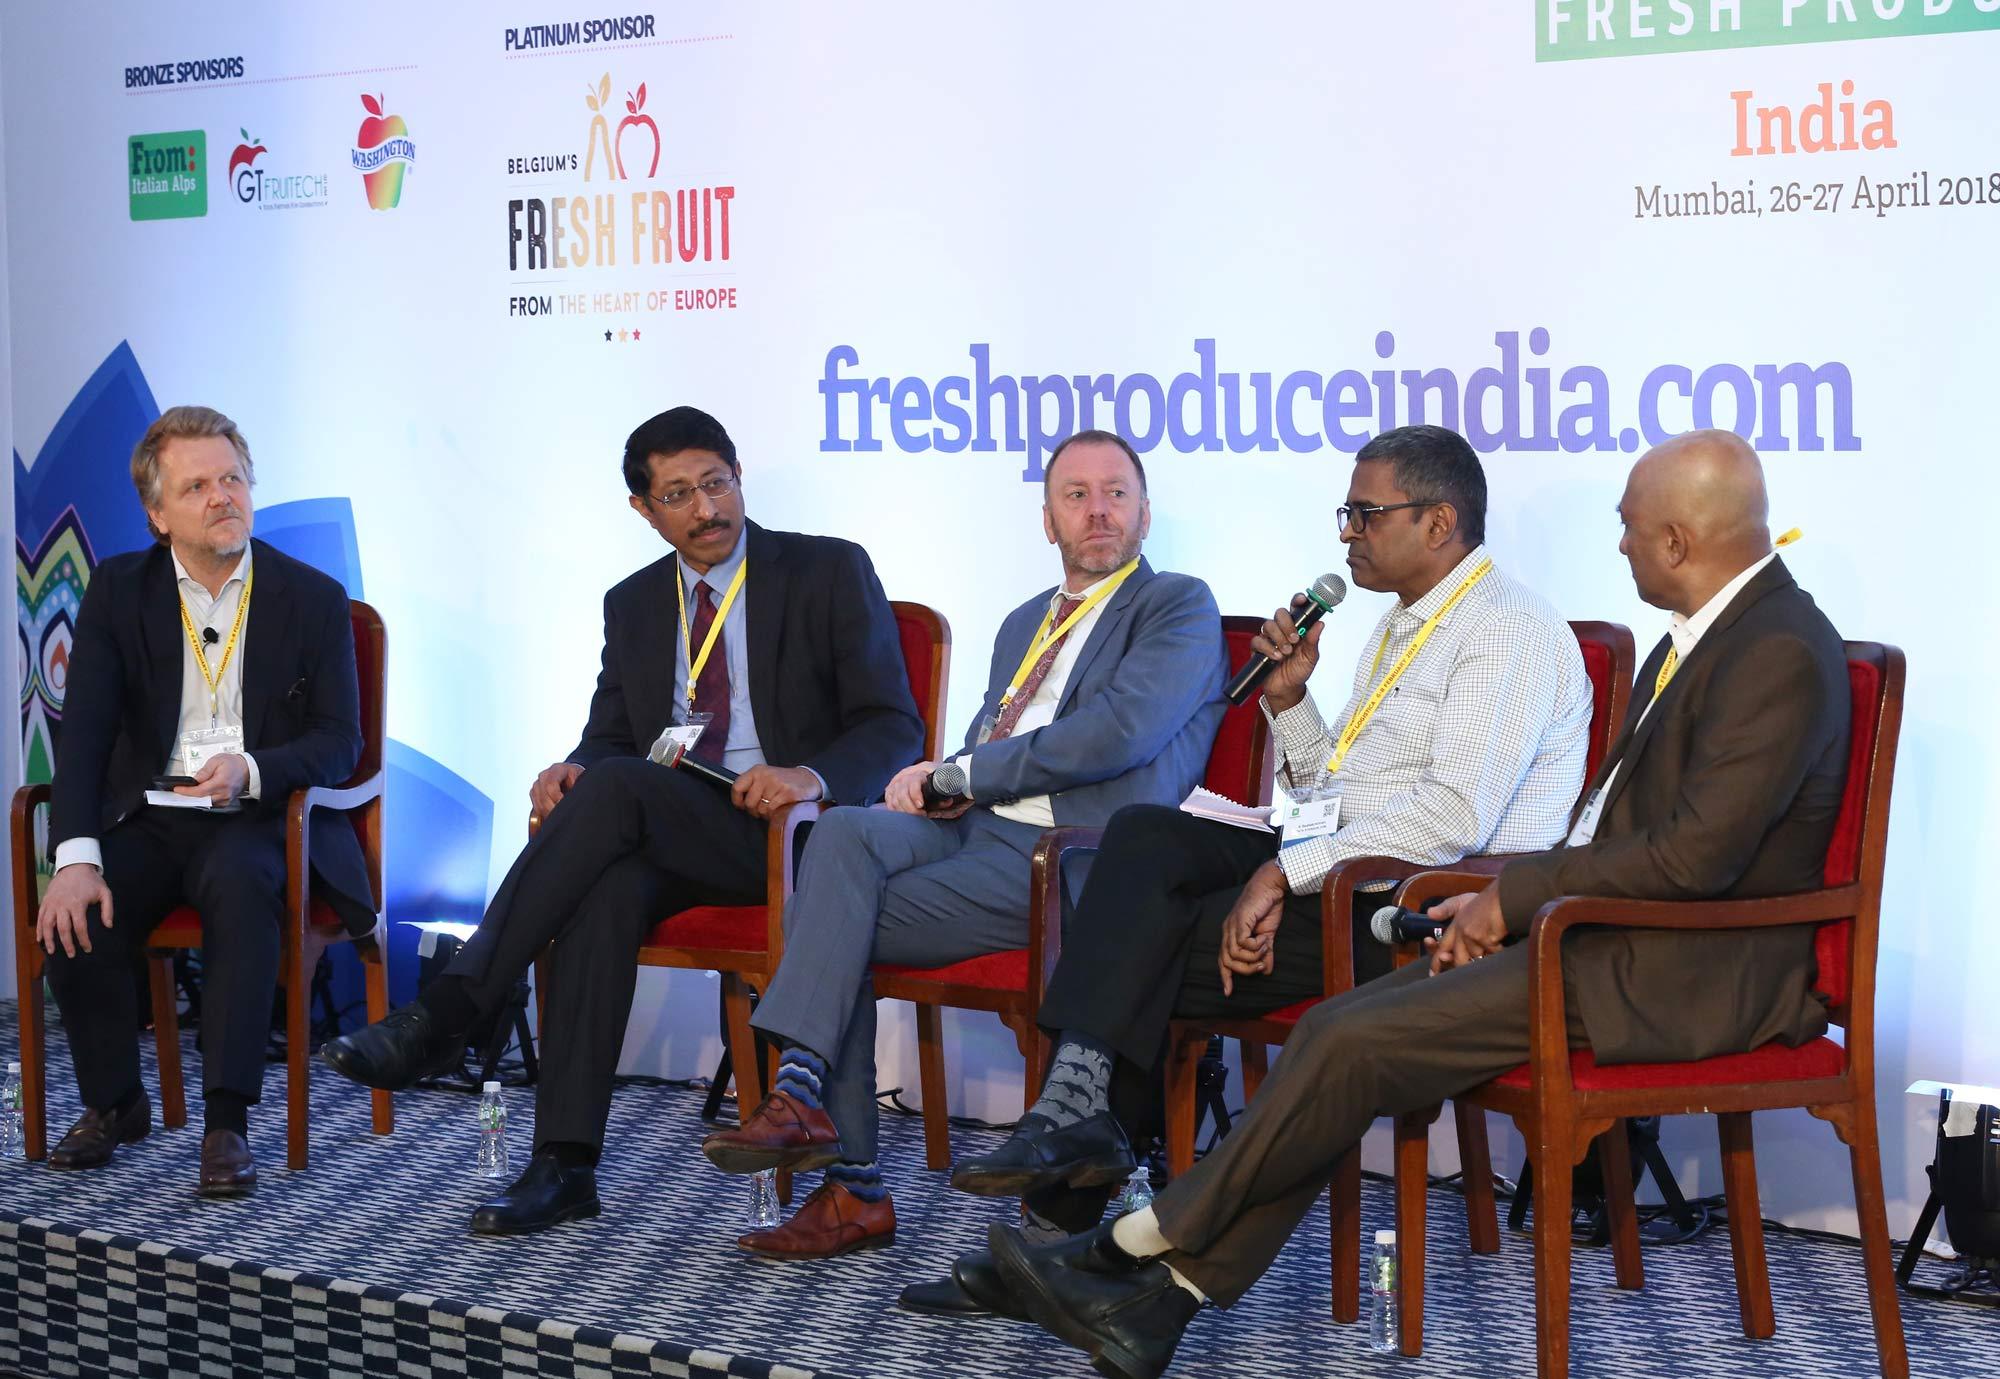 Fresh Produce India: the event for fresh ideas